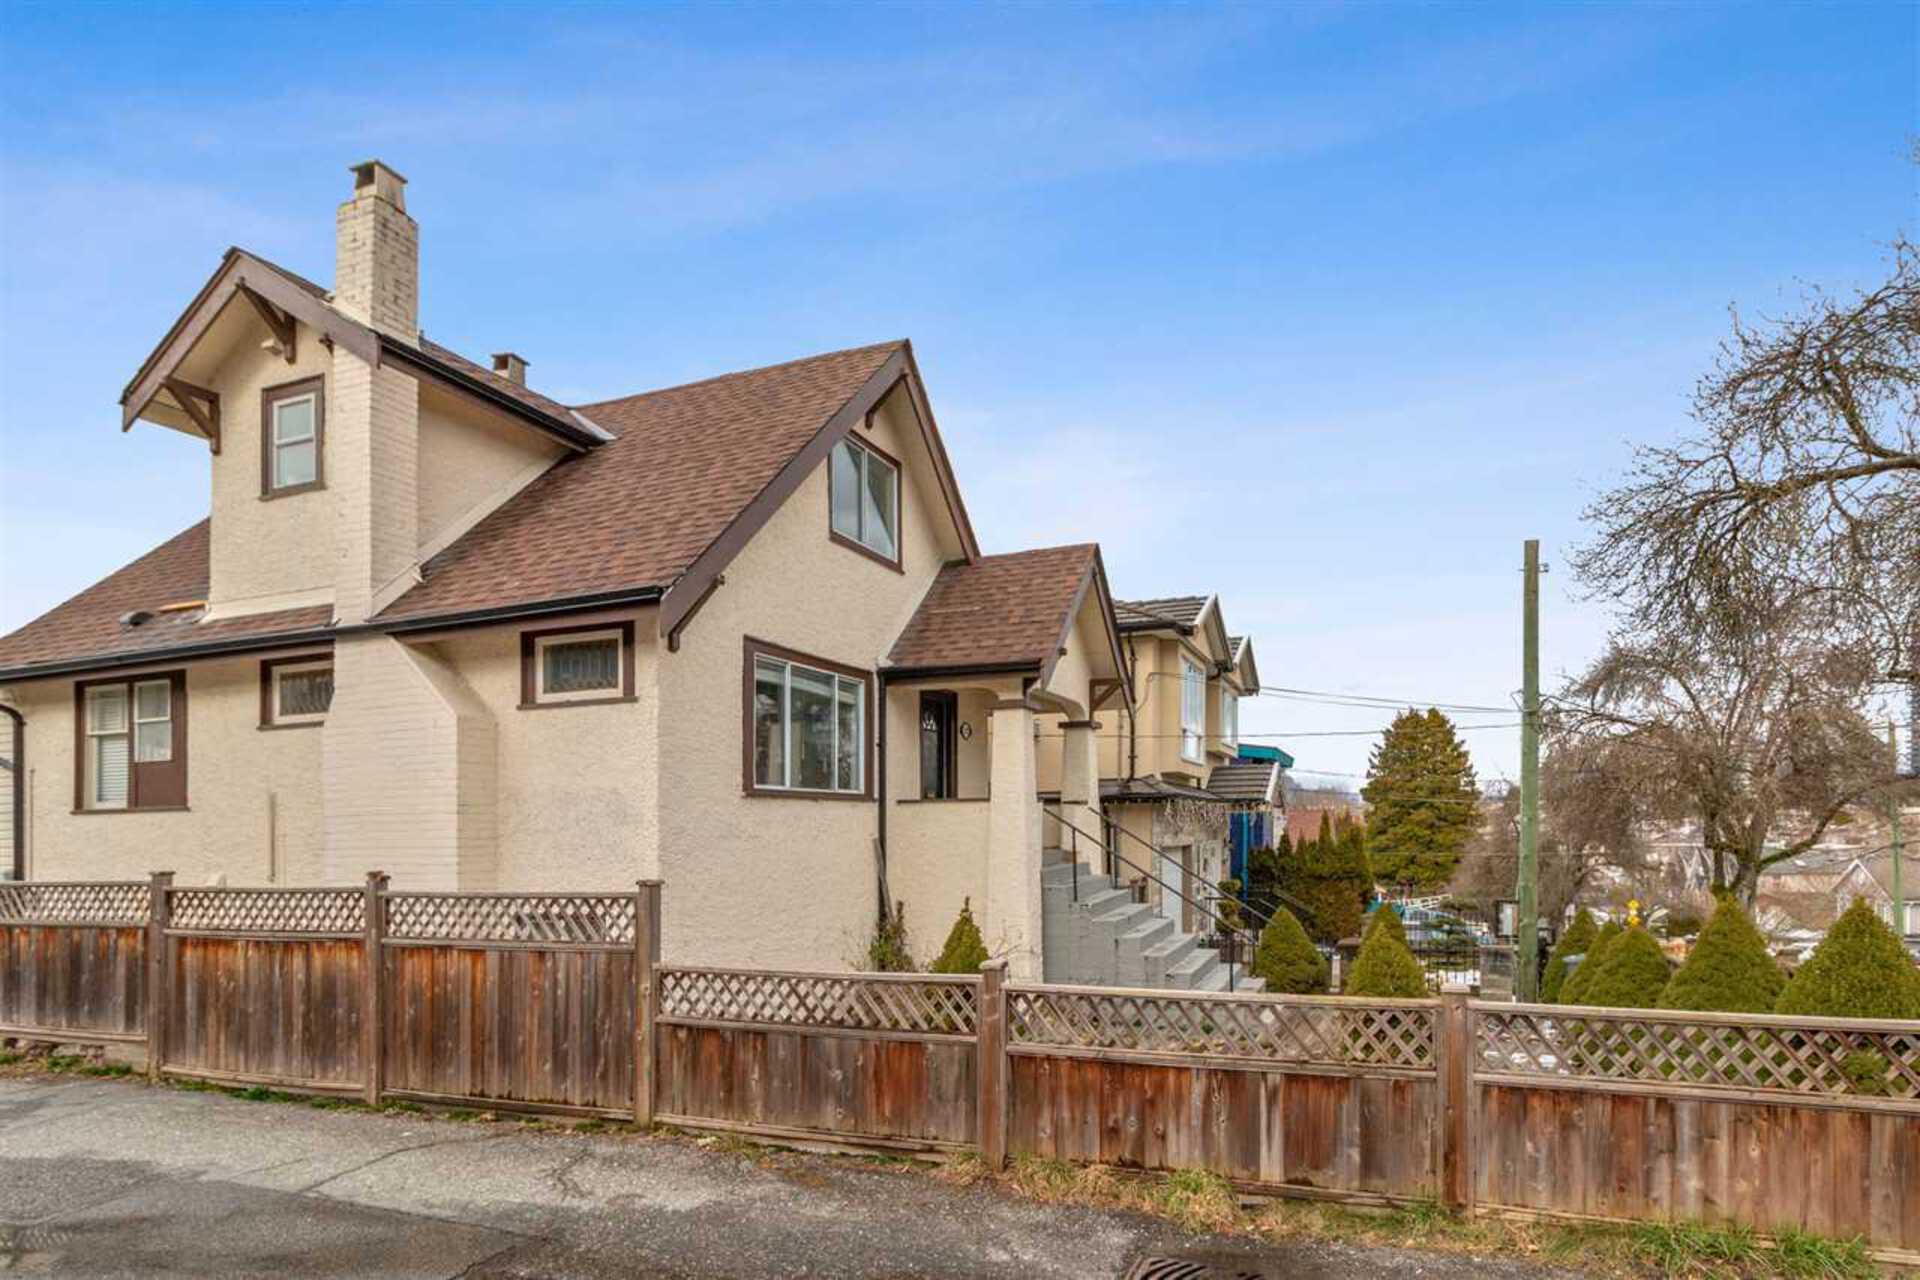 5375-mckinnon-street-collingwood-ve-vancouver-east-17 at 5375 Mckinnon Street, Collingwood VE, Vancouver East